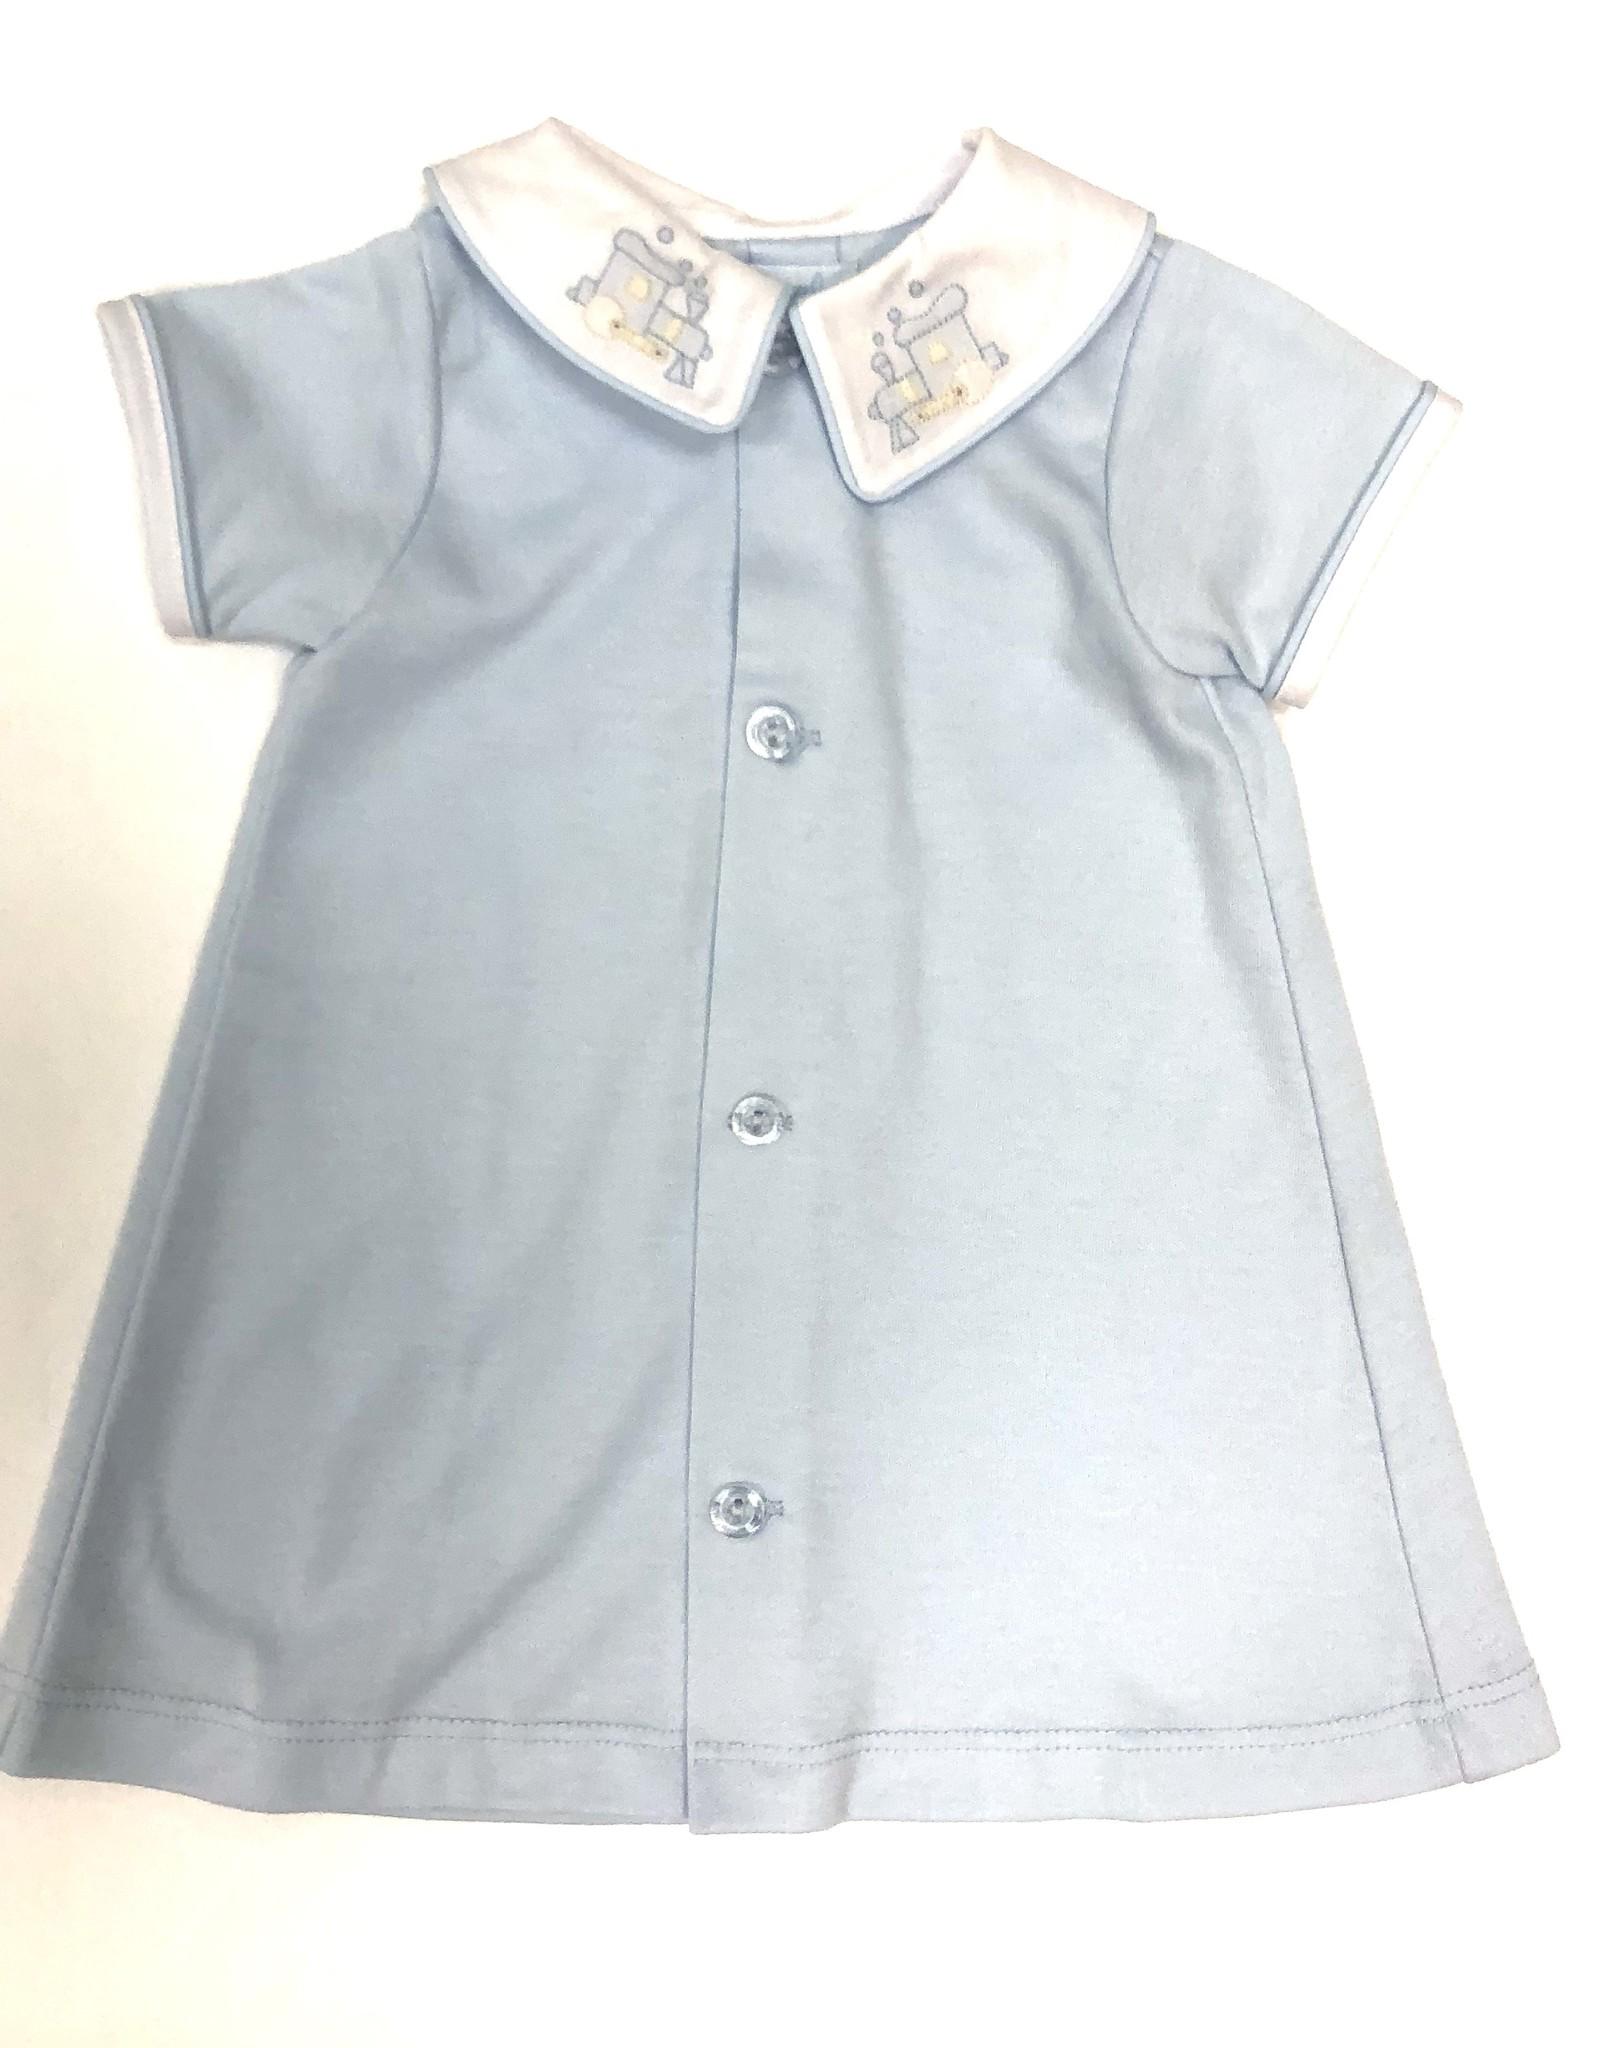 Auraluz Blue Train Knit Day Gown